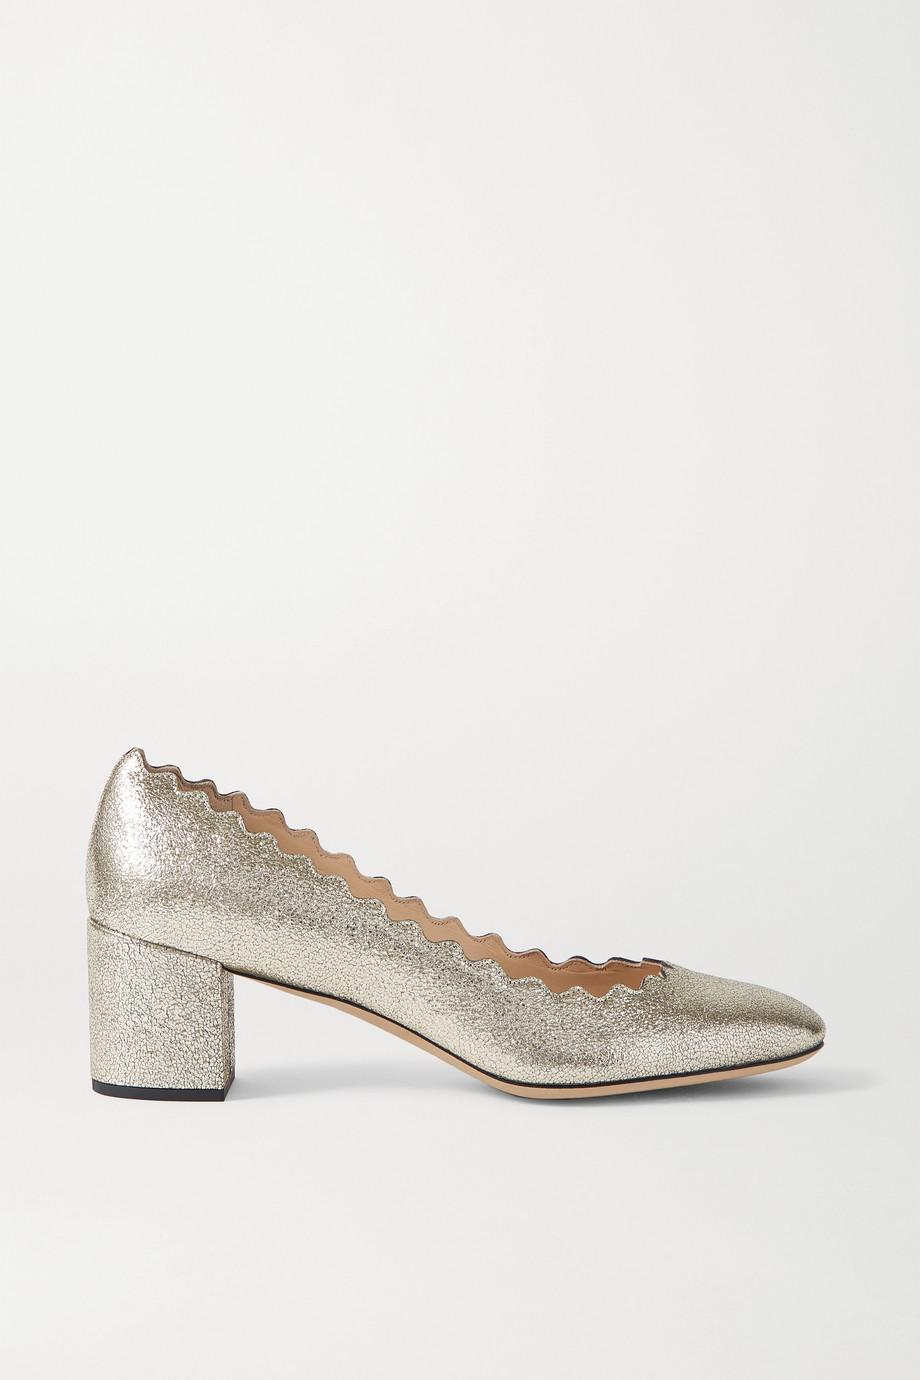 Chloé Lauren scalloped metallic cracked-leather pumps